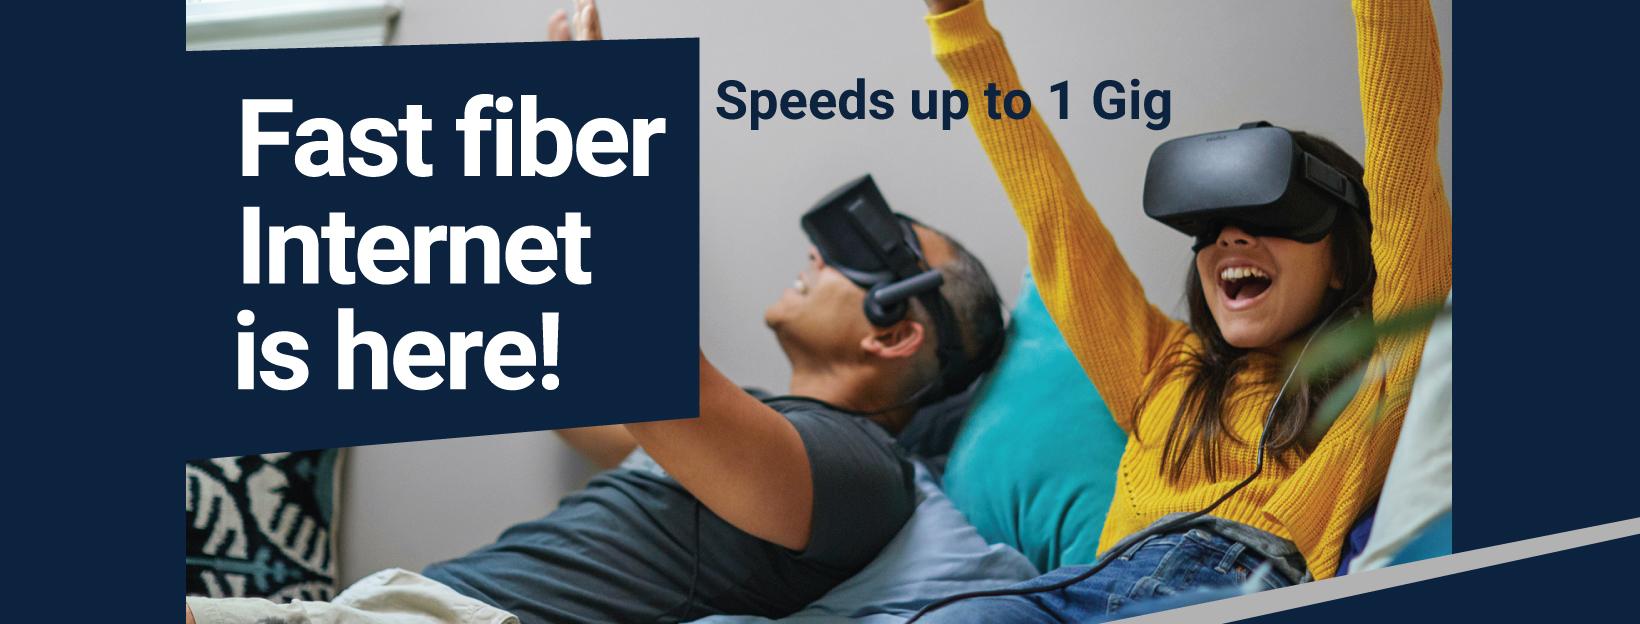 Fiber Internet is here